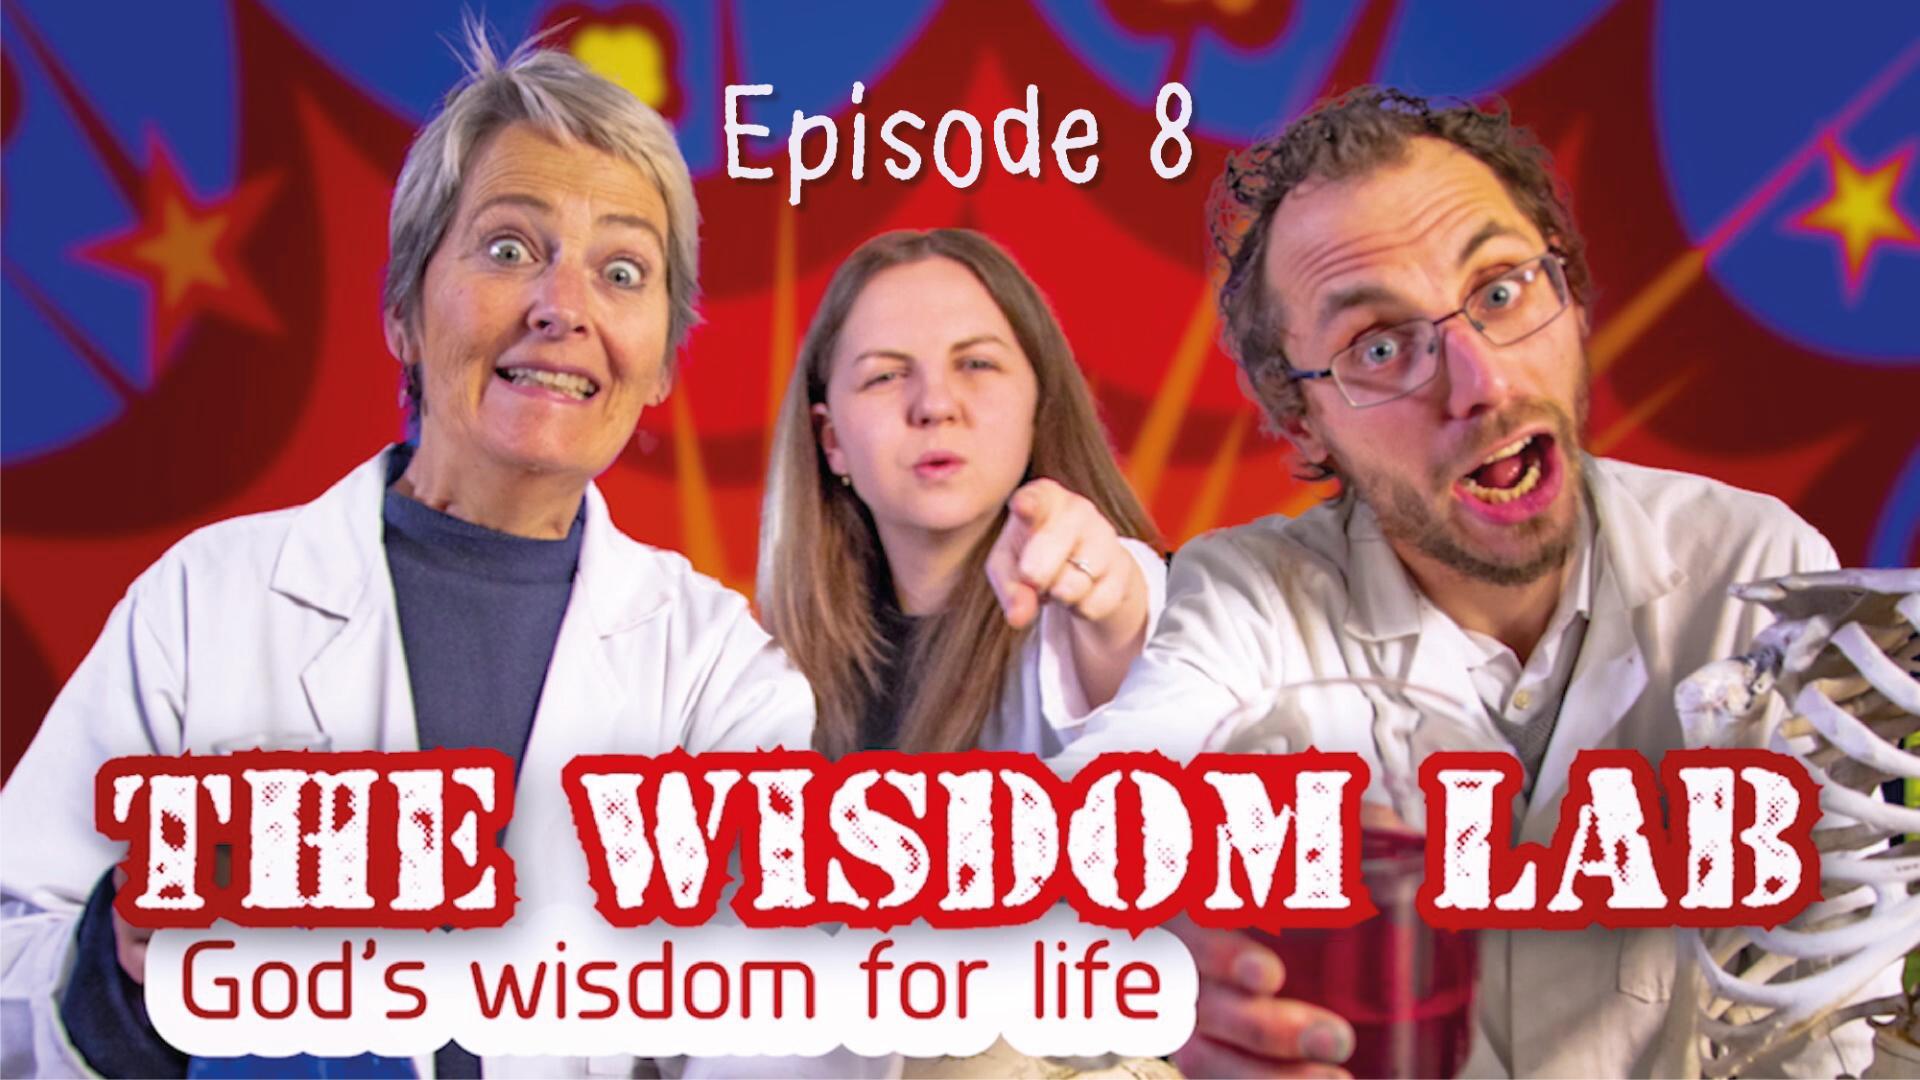 The Wisdom Lab: Episode 8